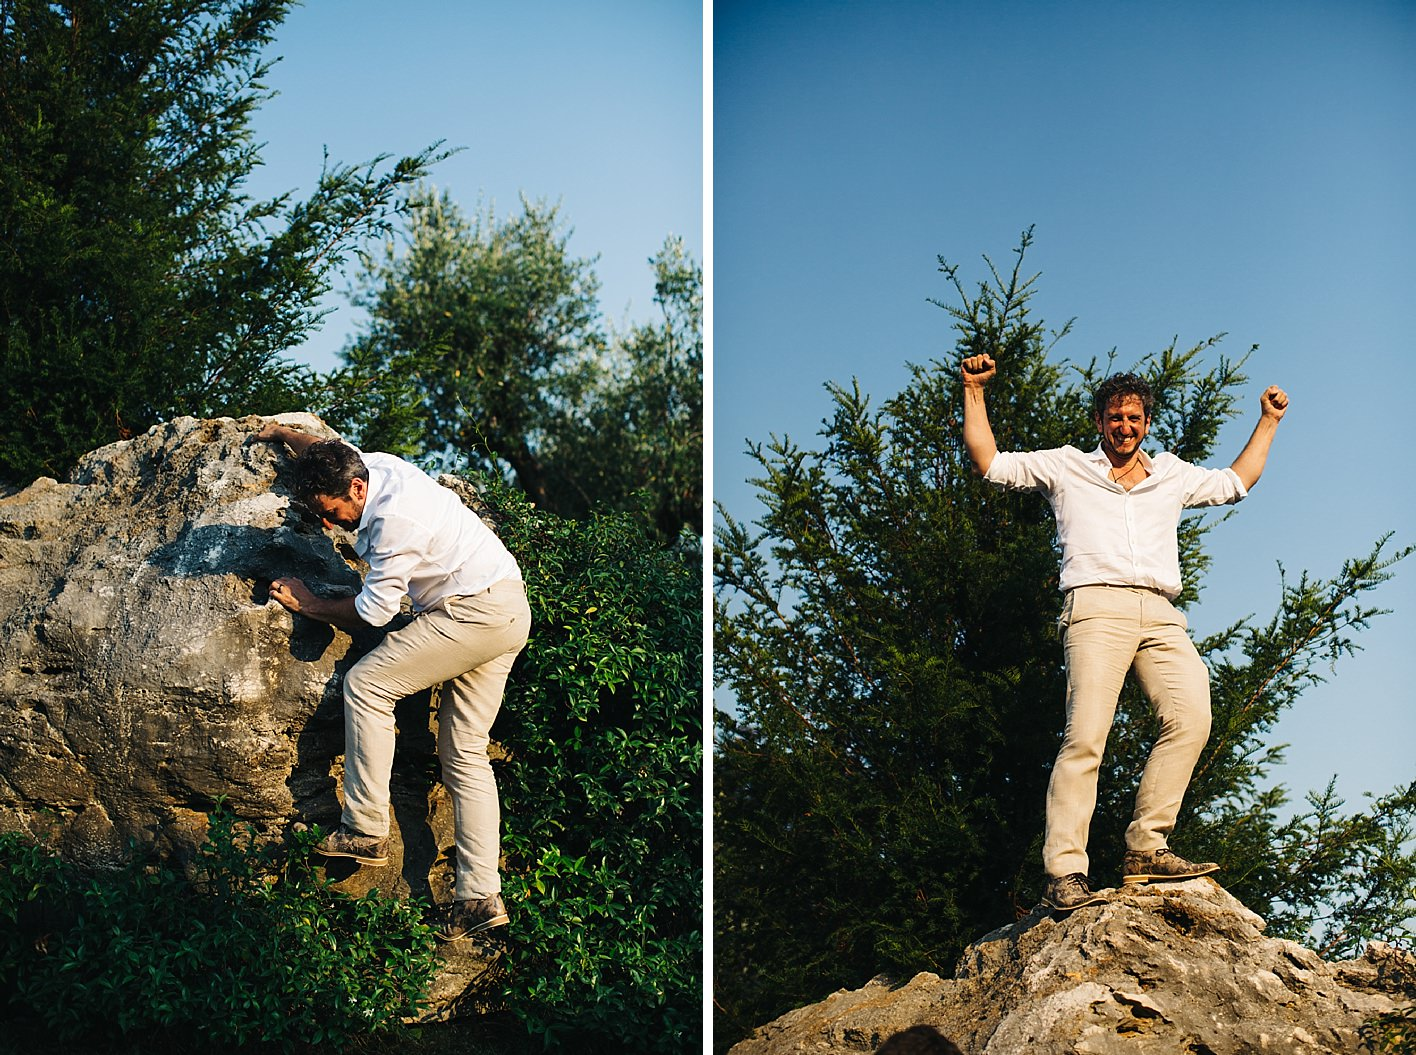 Groom climbing large bolder at wedding